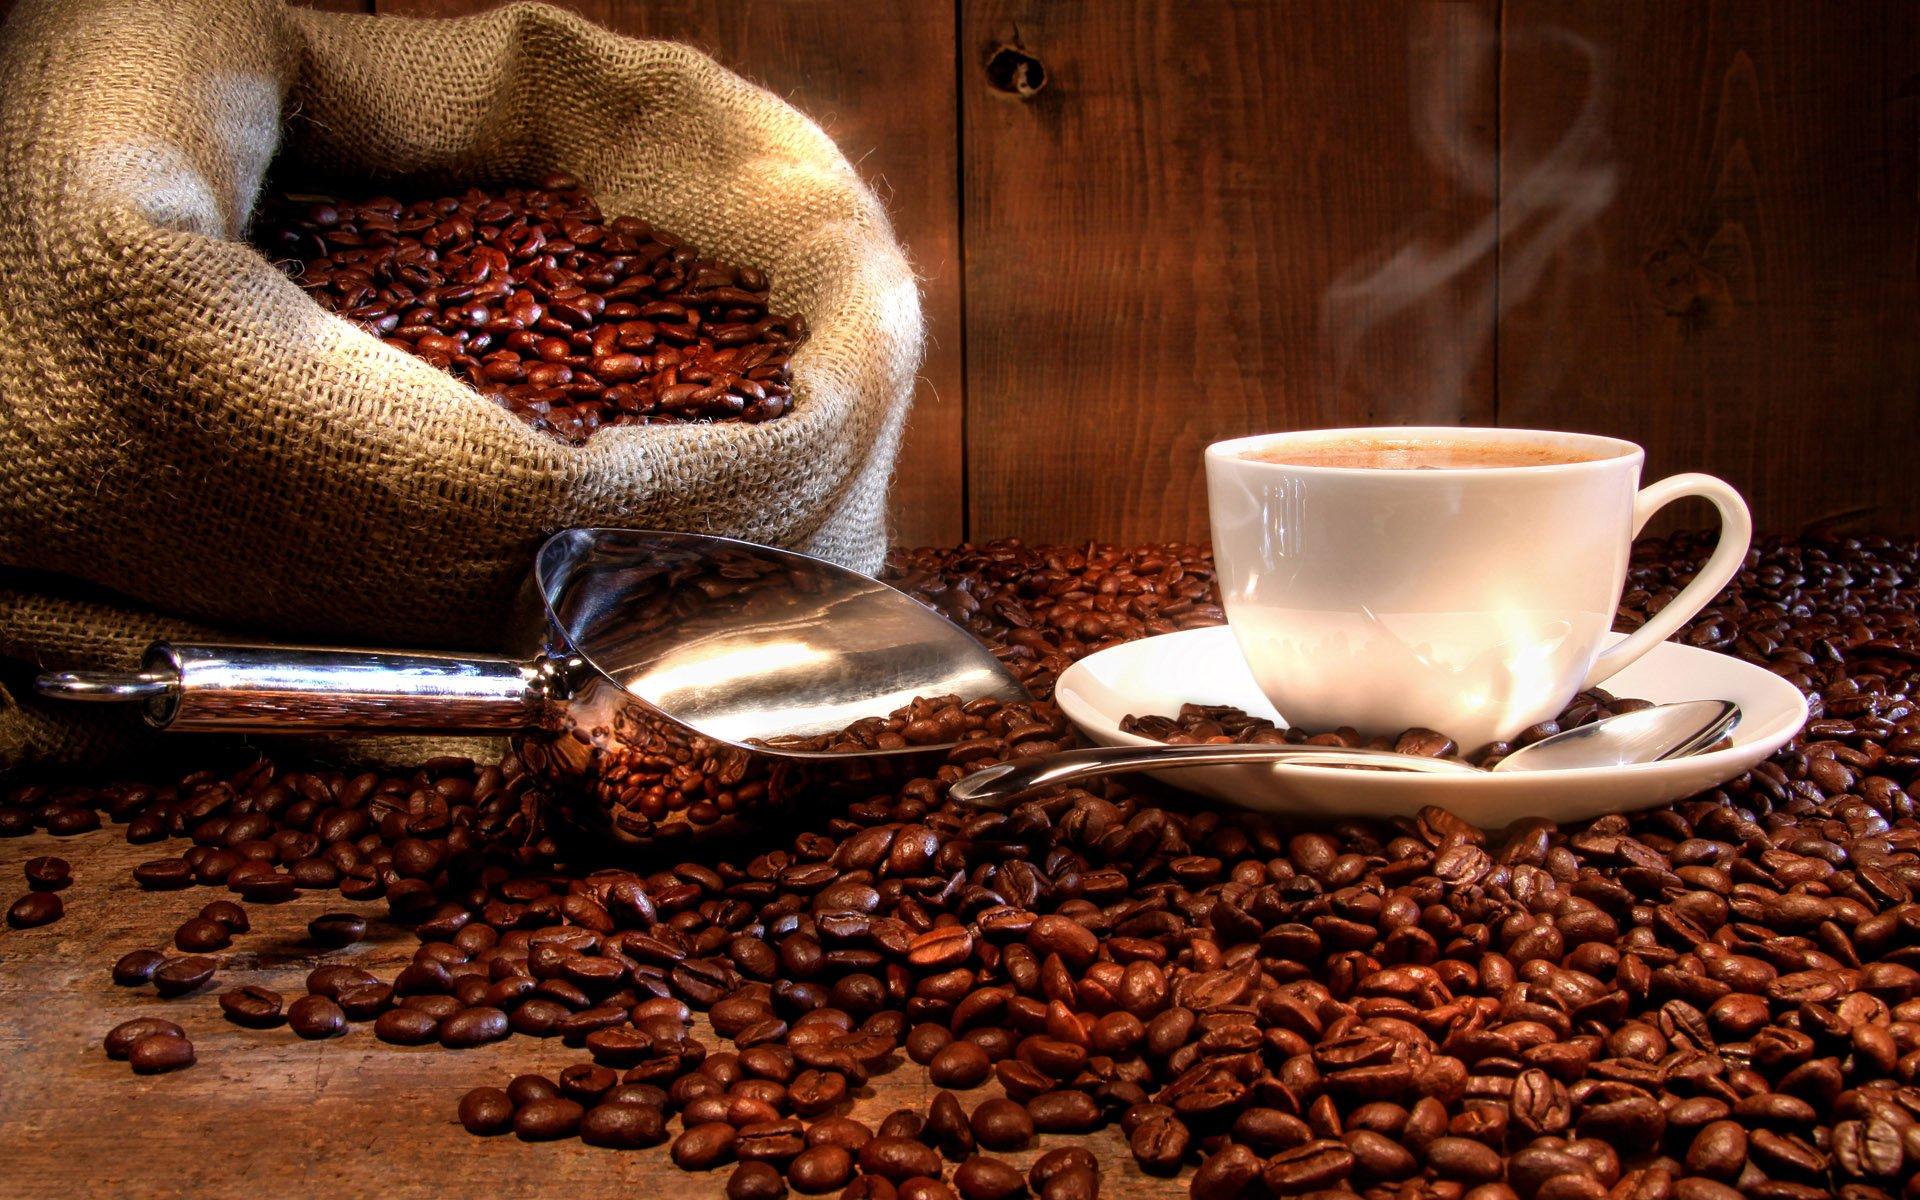 Peru Approcassi Cajamarca Fair Trade Shade Grown Organic Coffee Beans (Medium Roast (Full City +), 15 Pounds Whole Beans) by RhoadsRoast Coffees (Image #2)